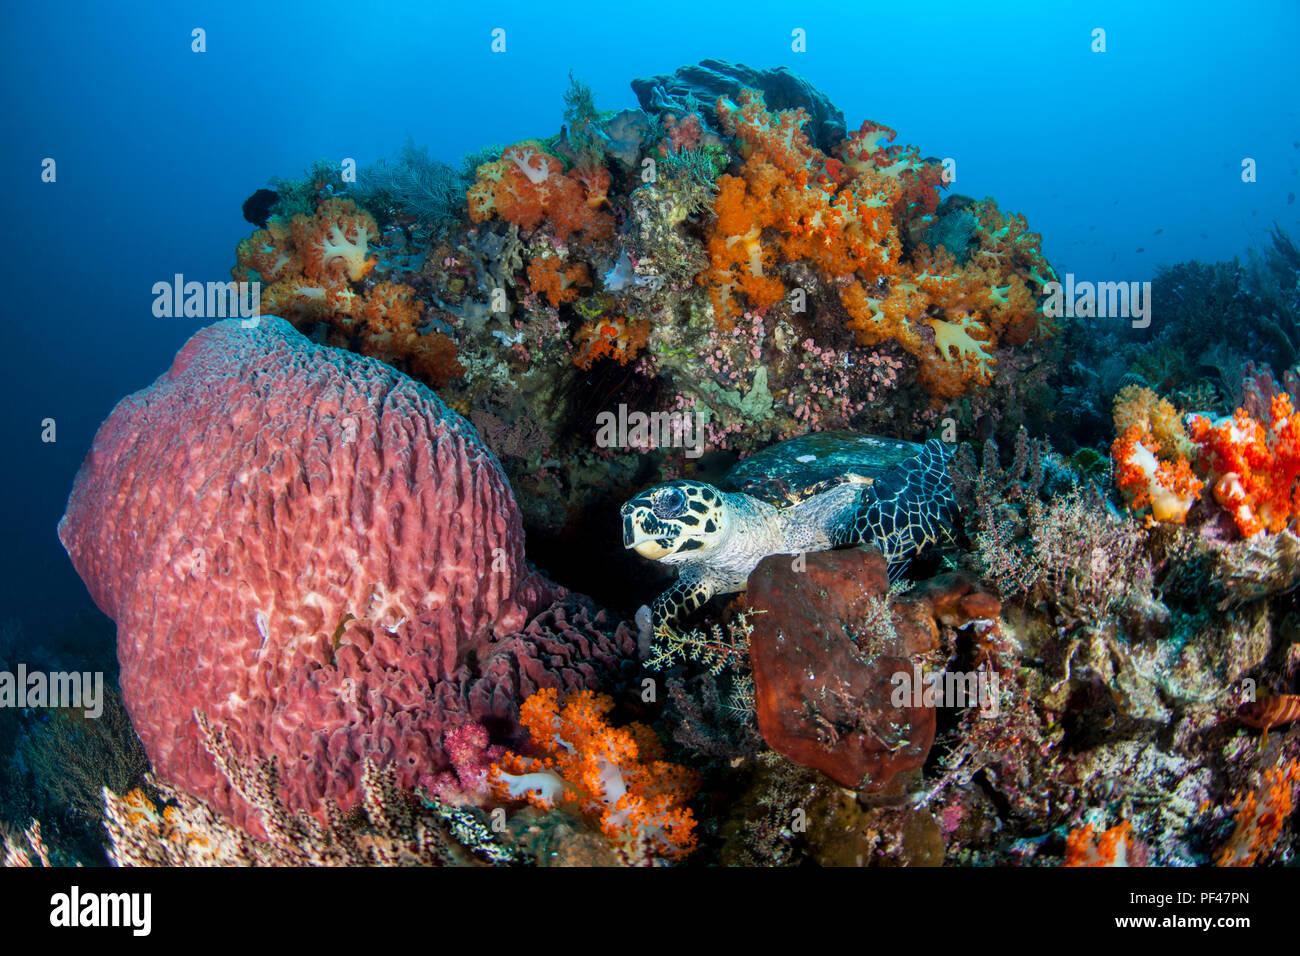 Hawksbill Sea Turtle Eretmochelys imbricata. Critically endangered - Stock Image